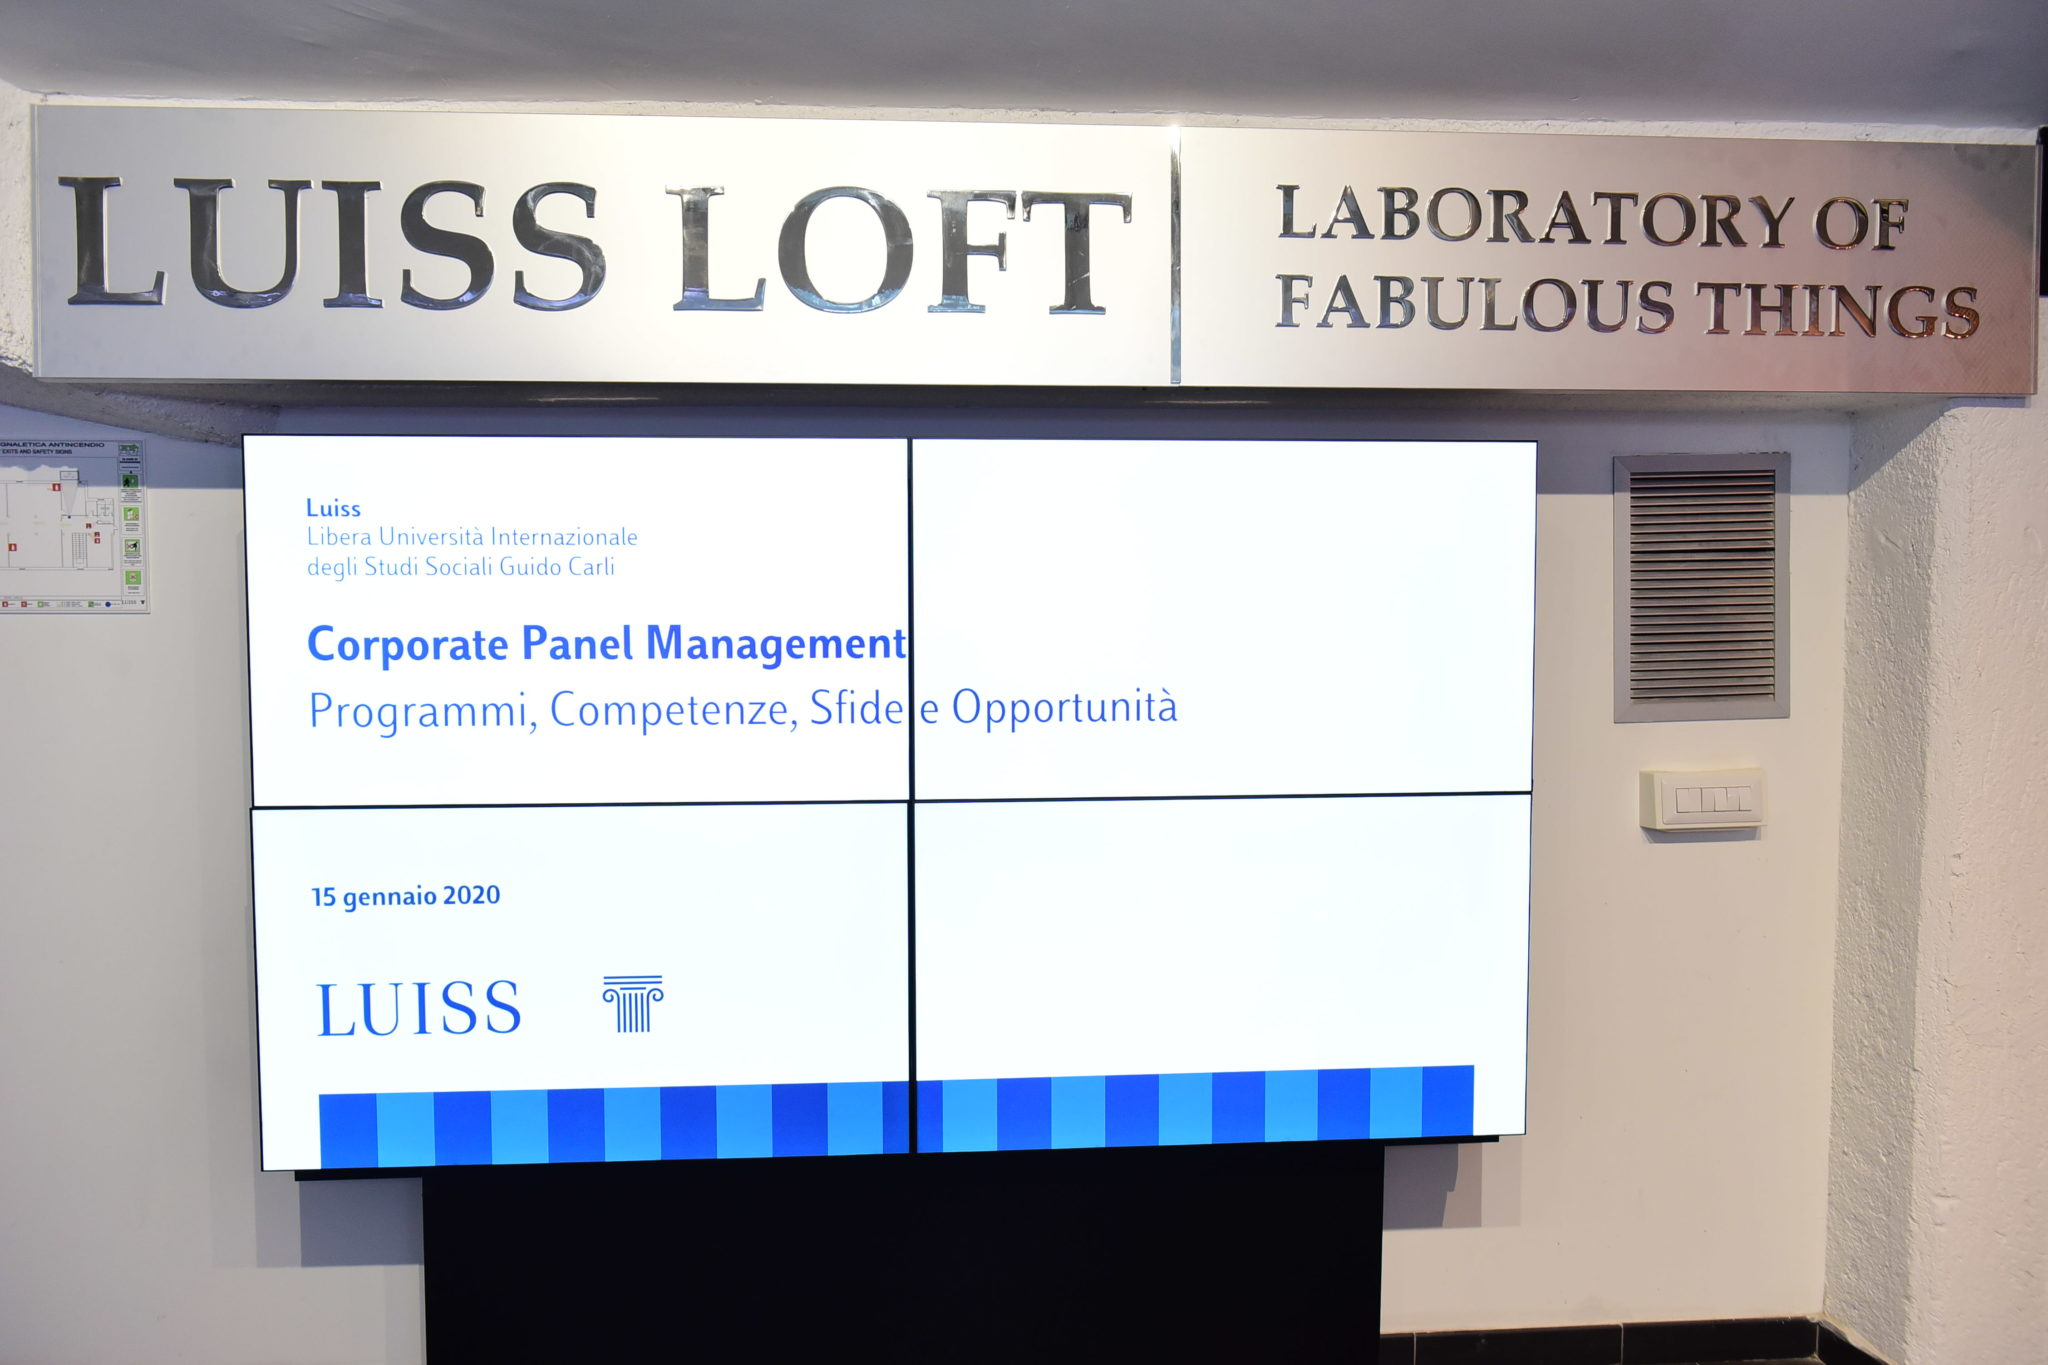 luiss-corporate-panel-management-1